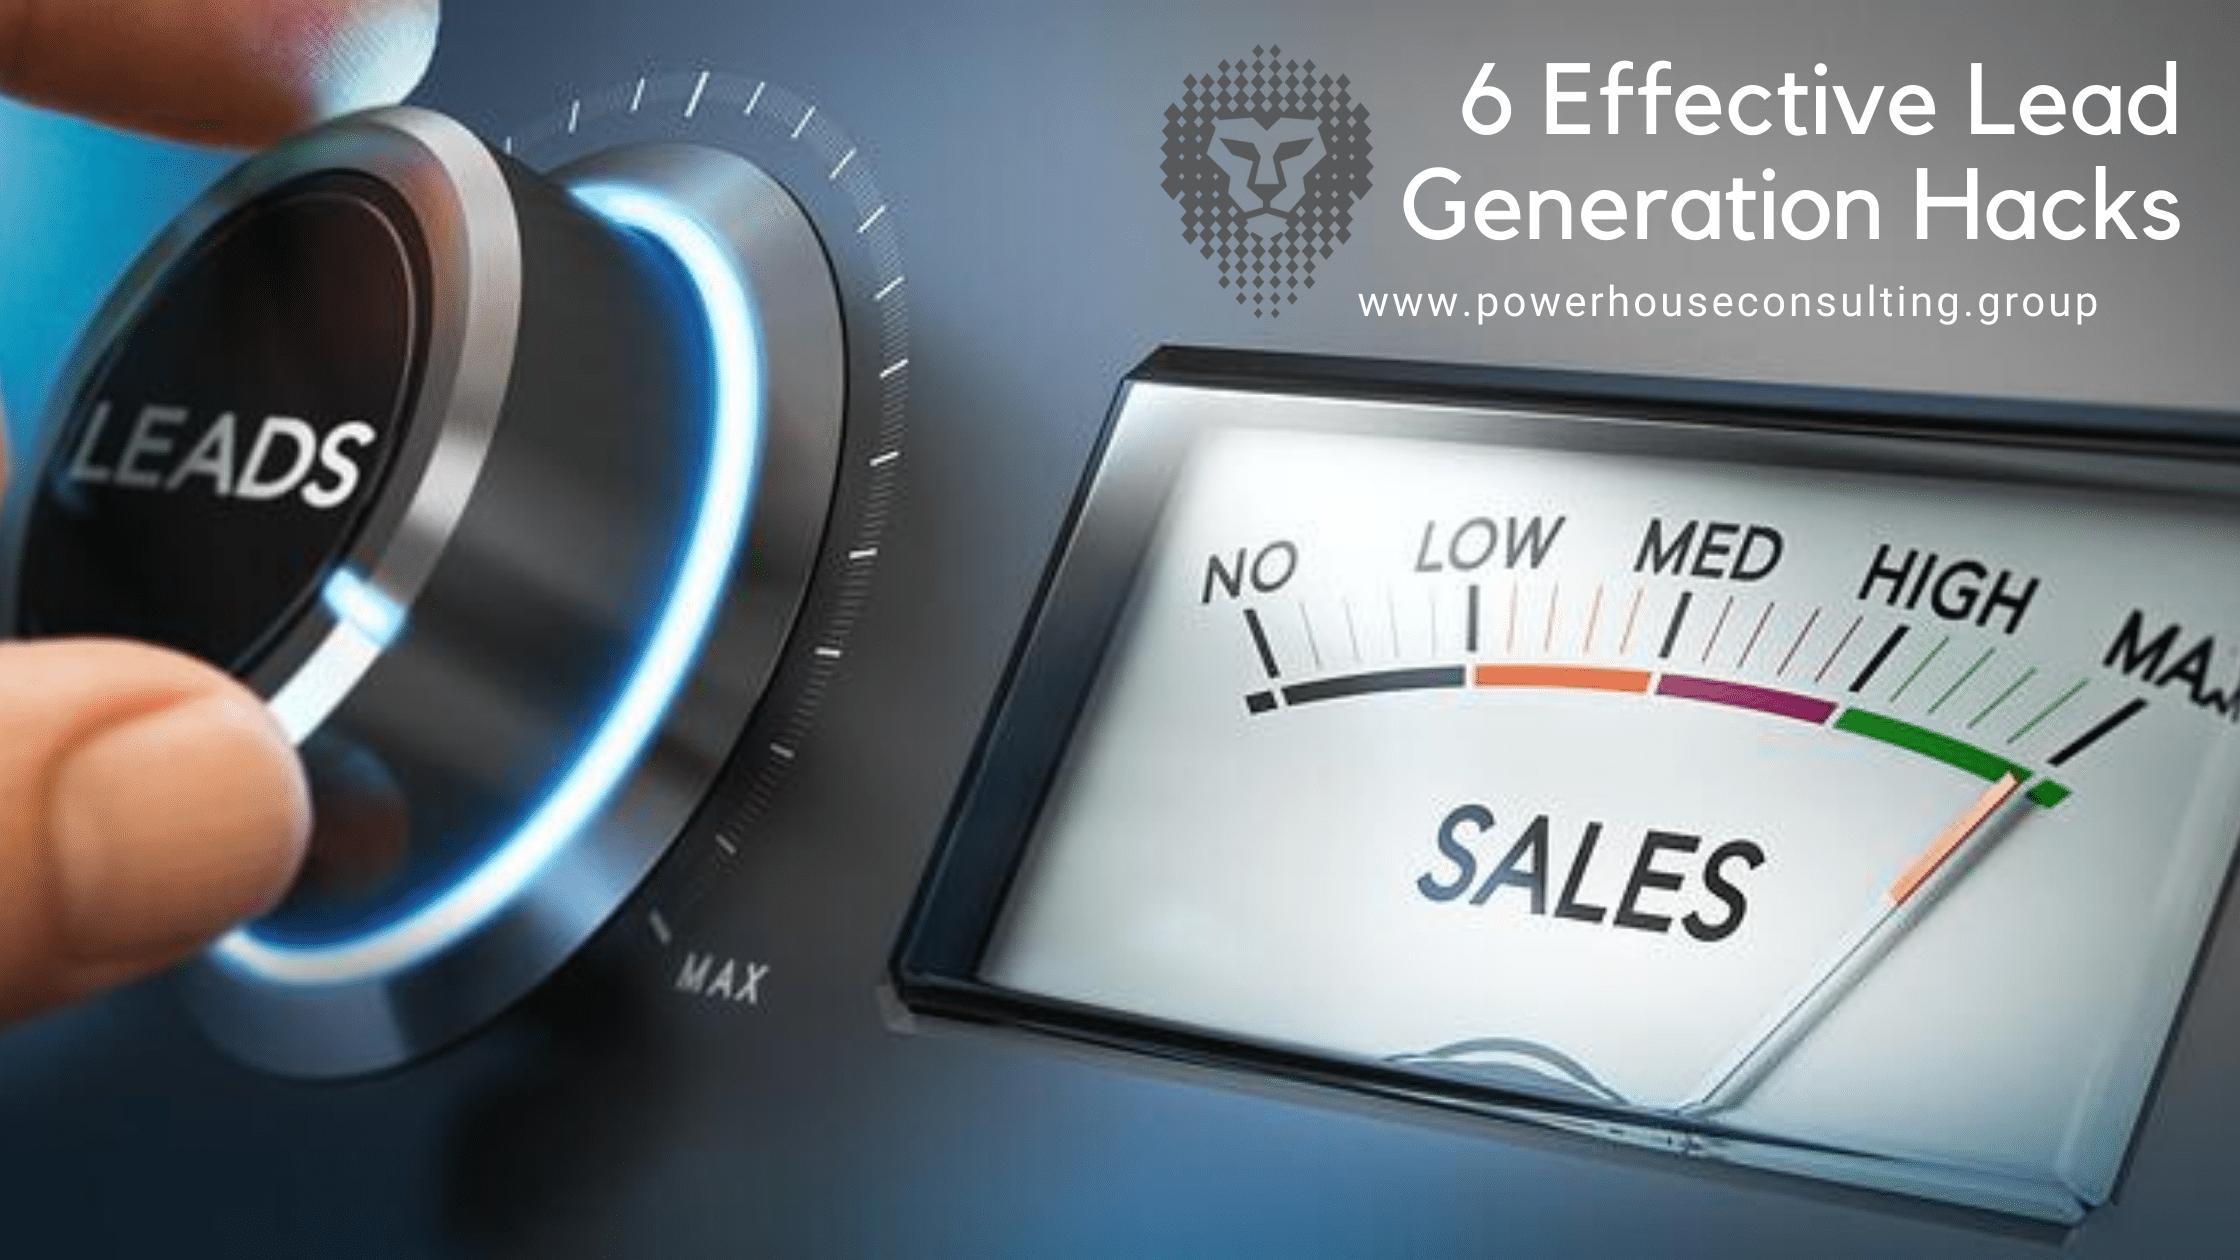 6 Effective Lead Generation Hacks